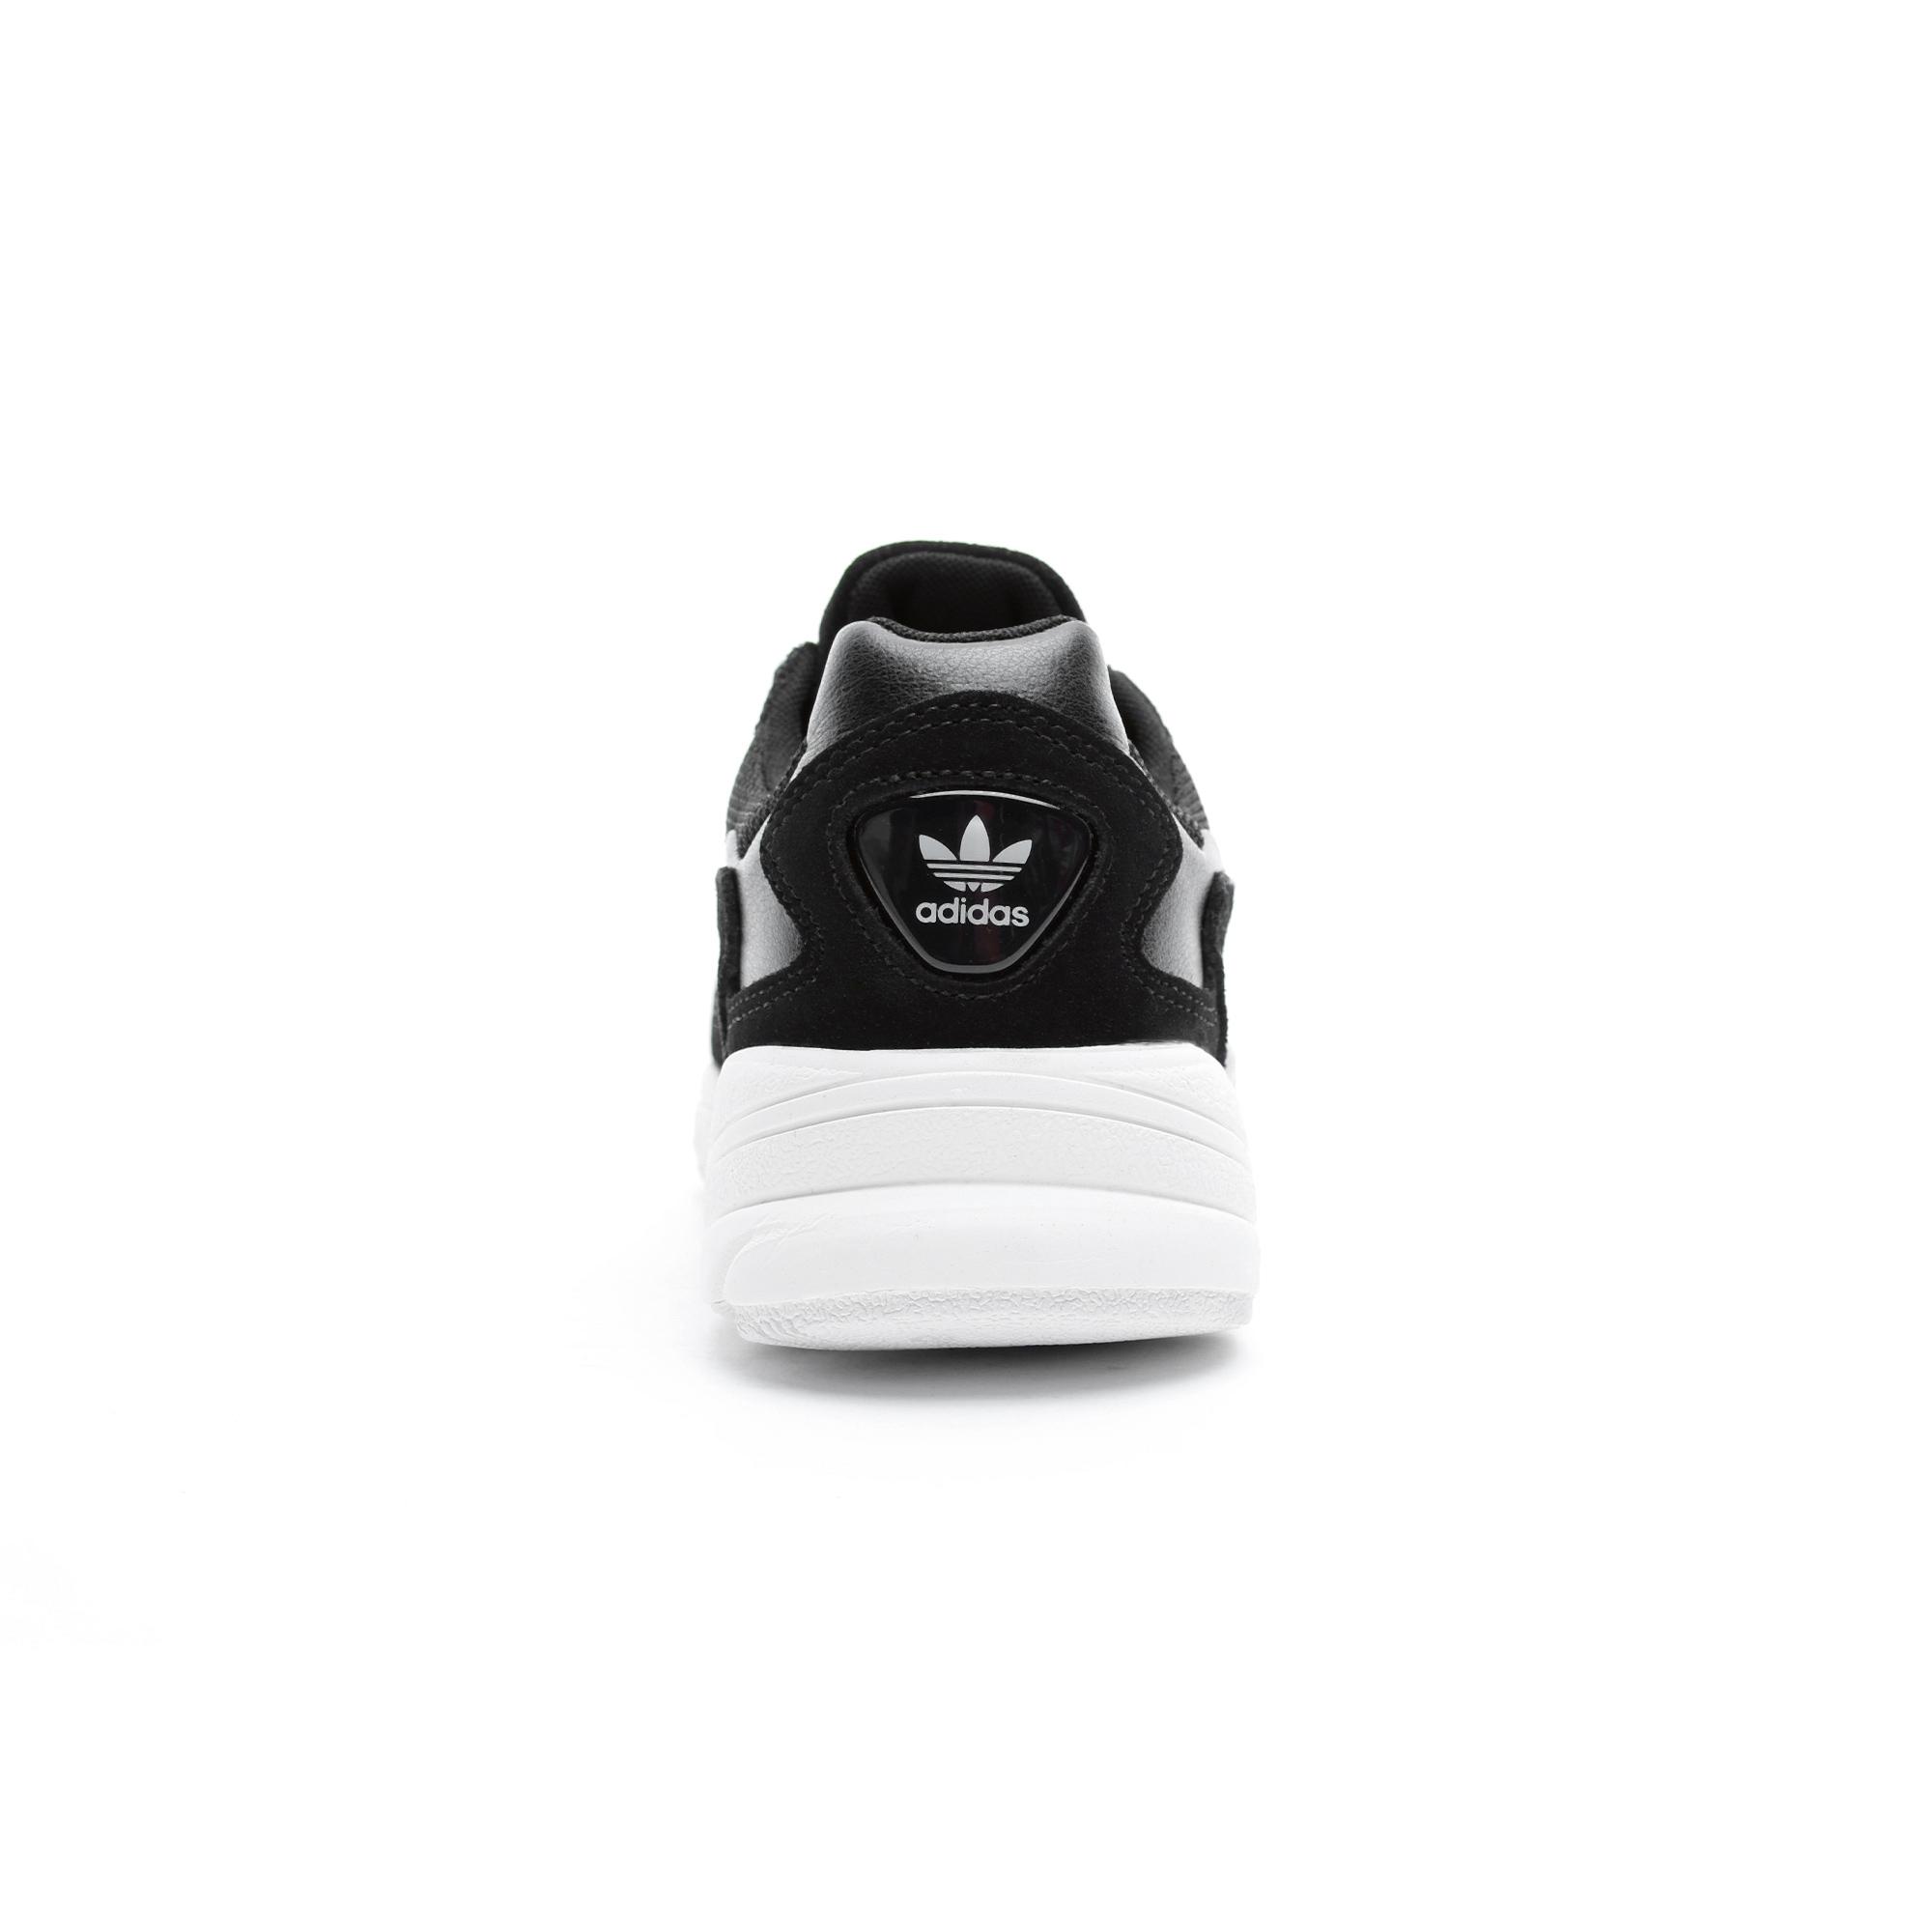 adidas Falcon Kadın Siyah Spor Ayakkabı